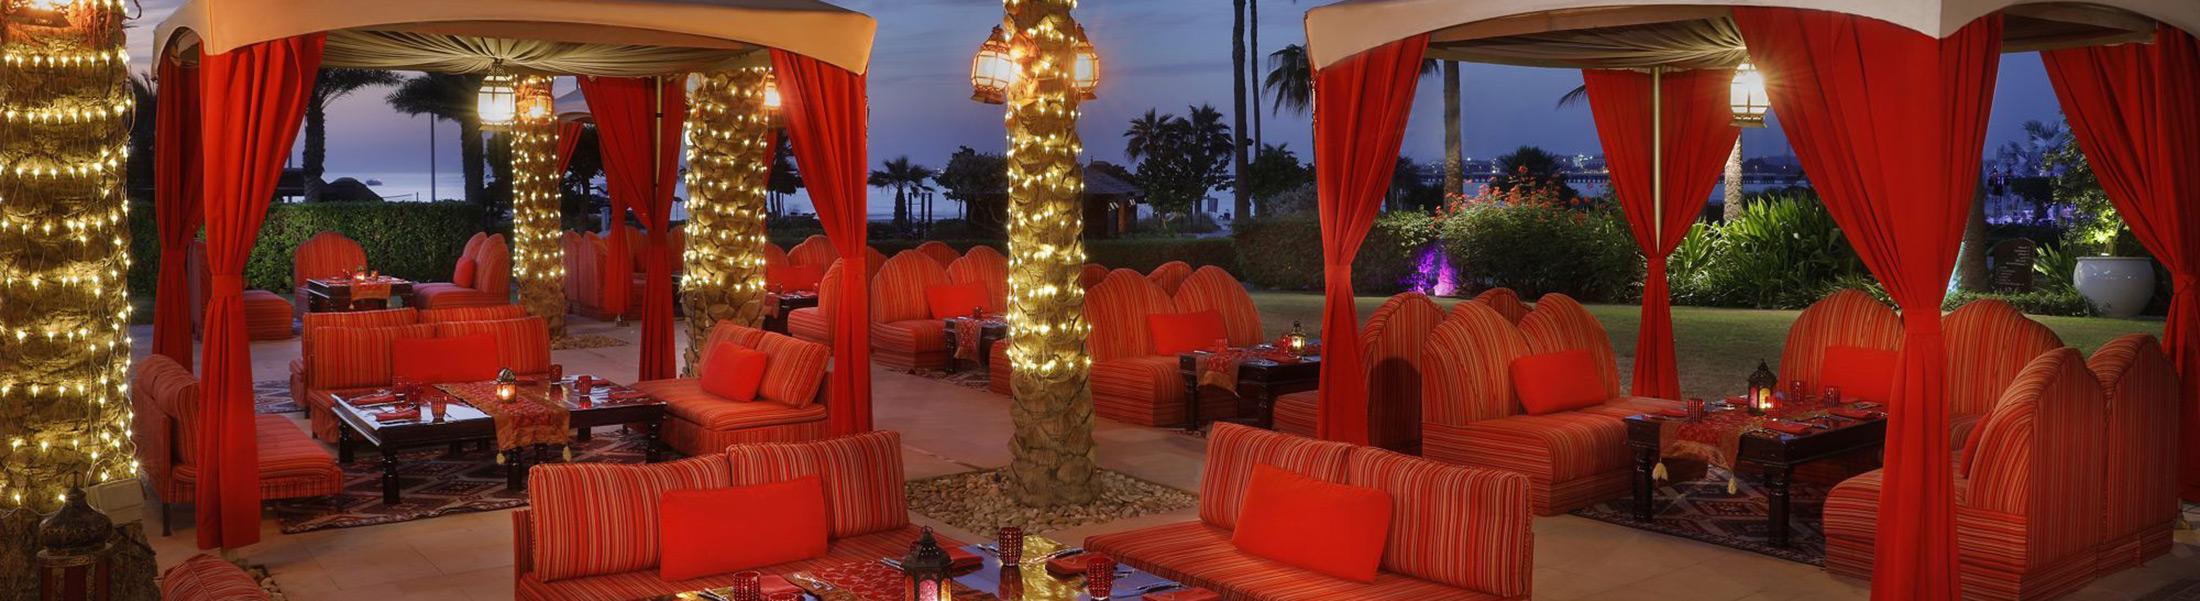 Dining in cabanas at Ritz-Carlton Dubai